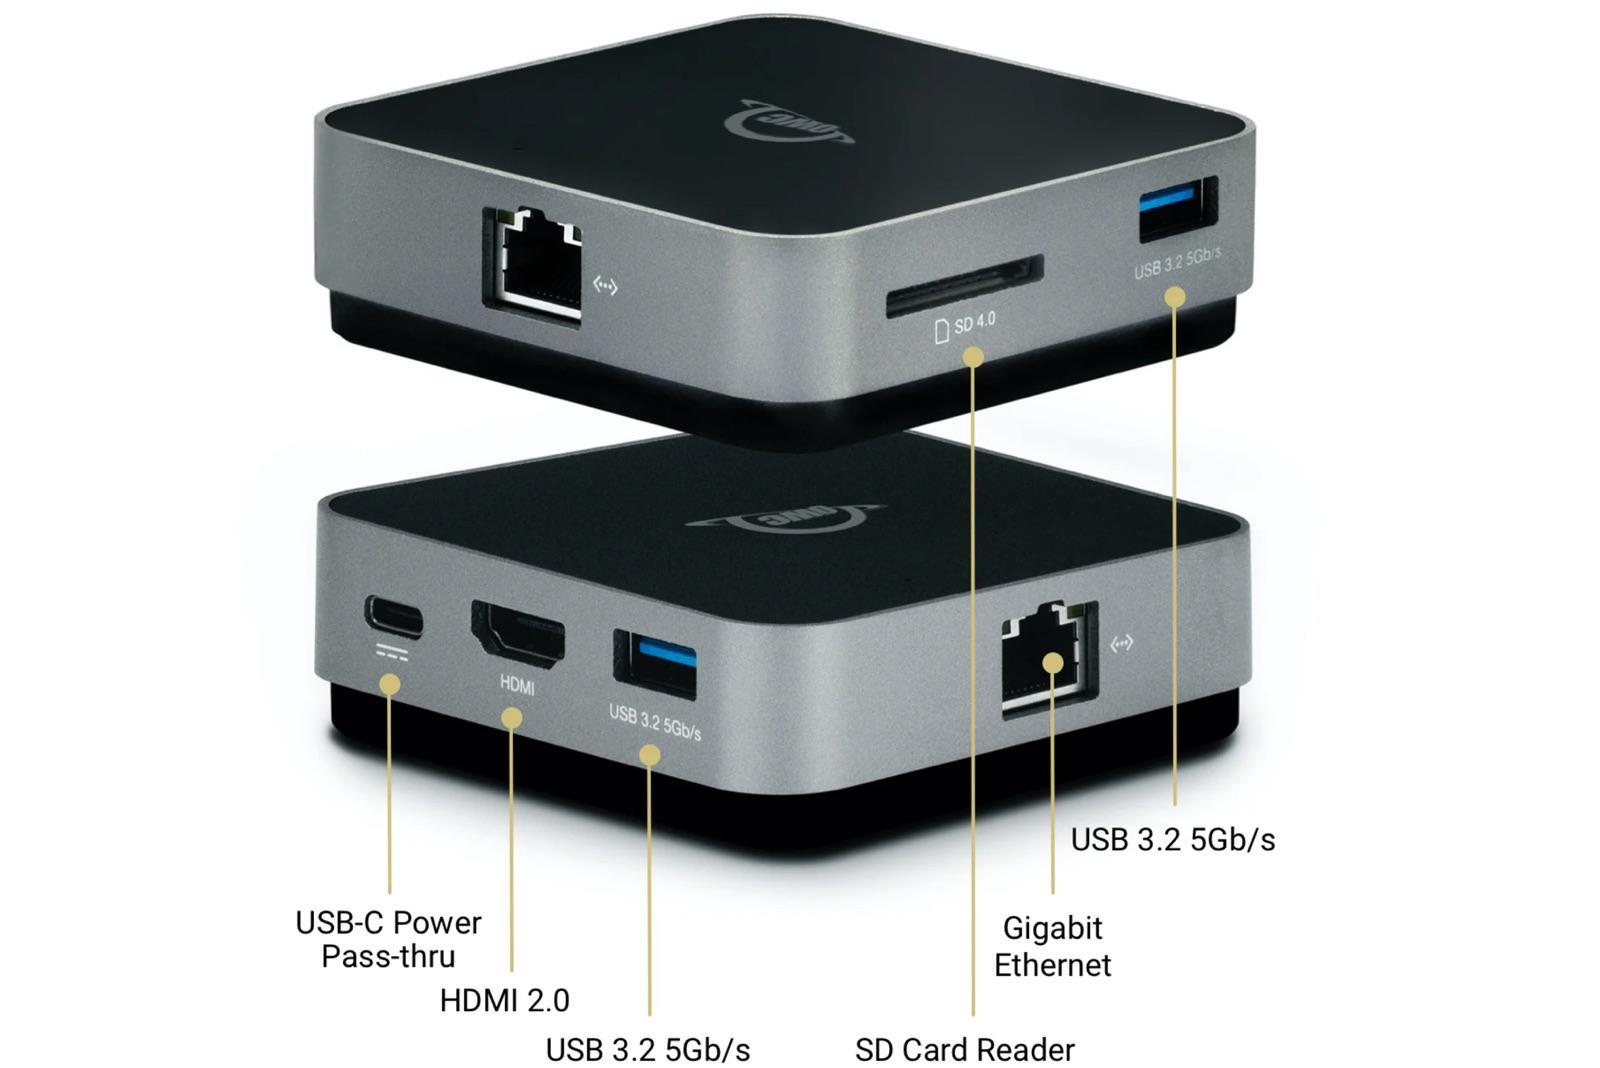 USB-C Travel Dock E